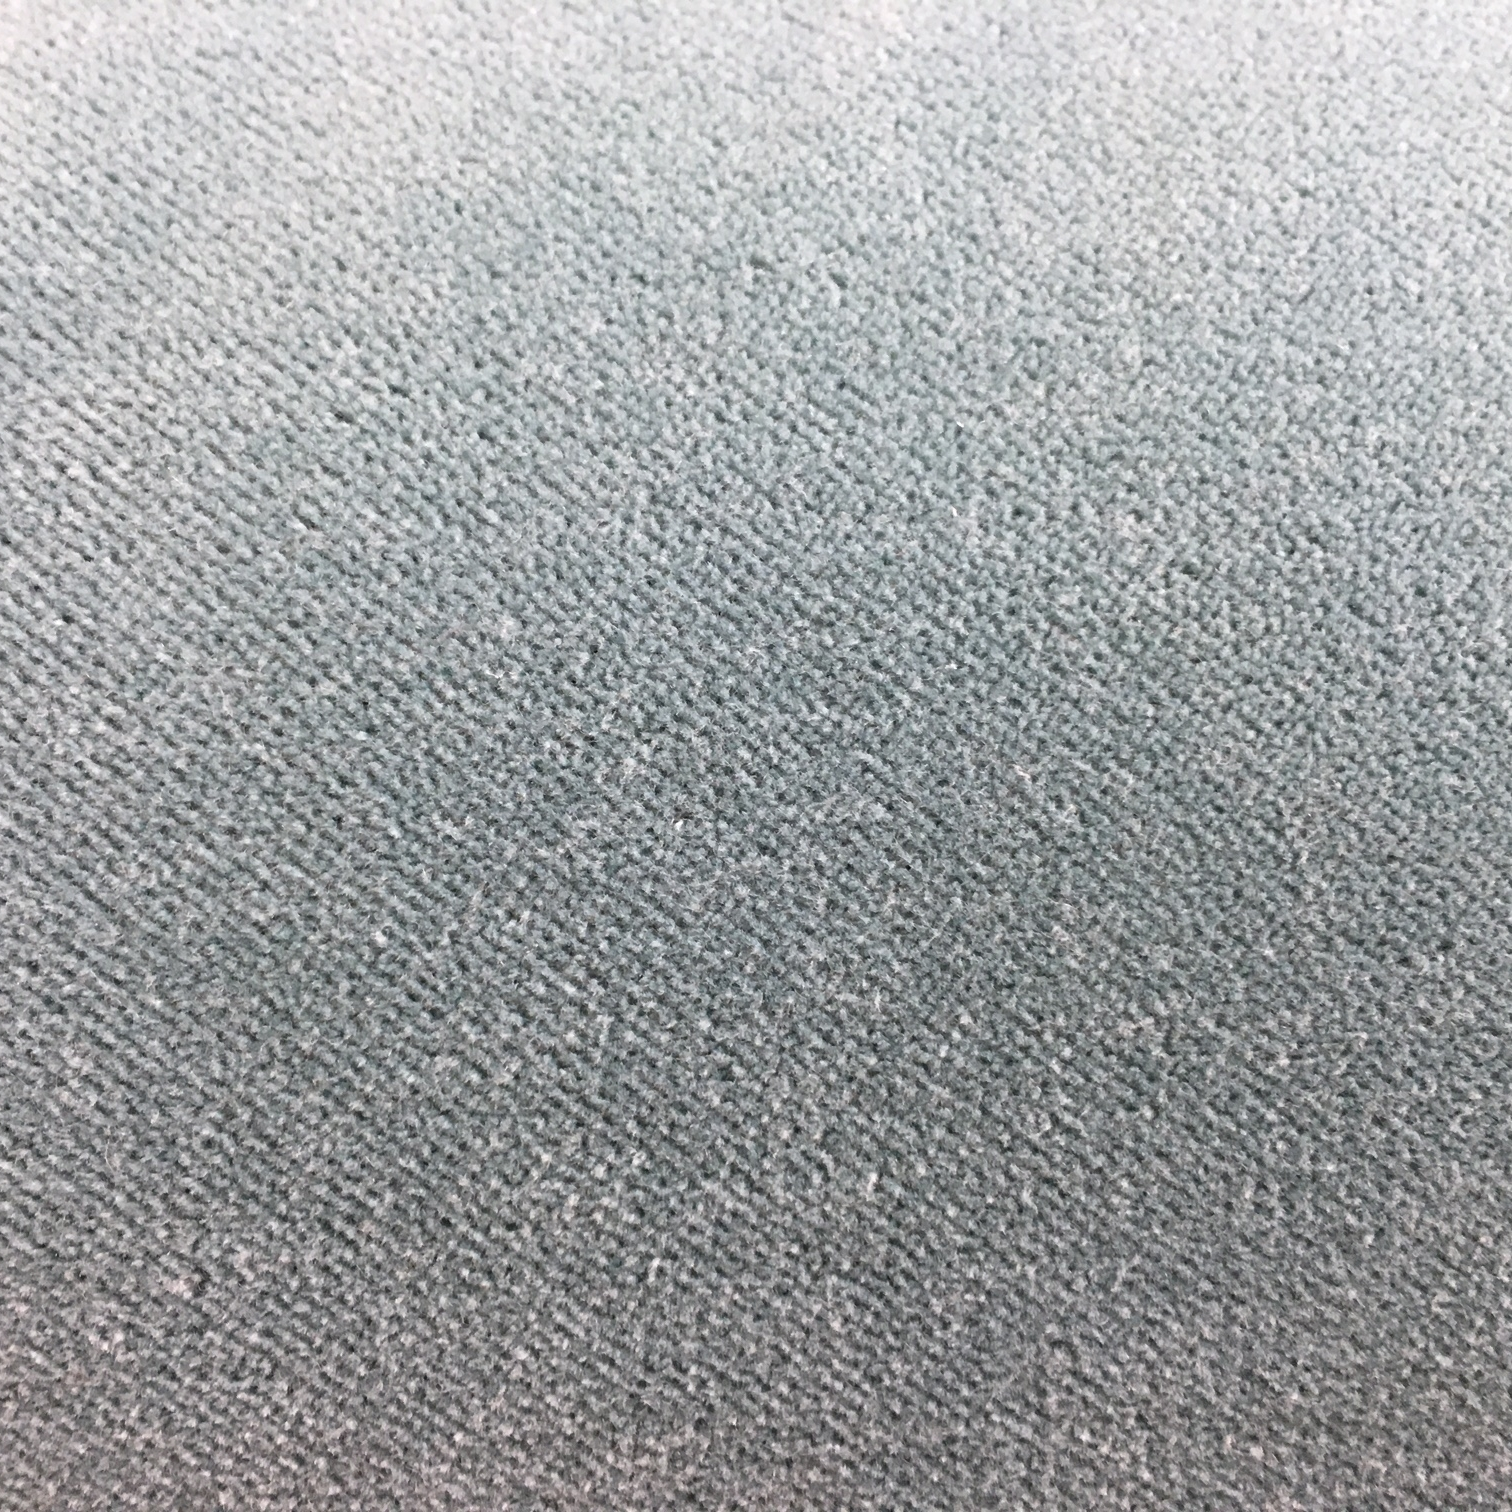 Porto Whirlpool  Style: Velvet Fabrics ID: 15908 Retail Price: $38.90